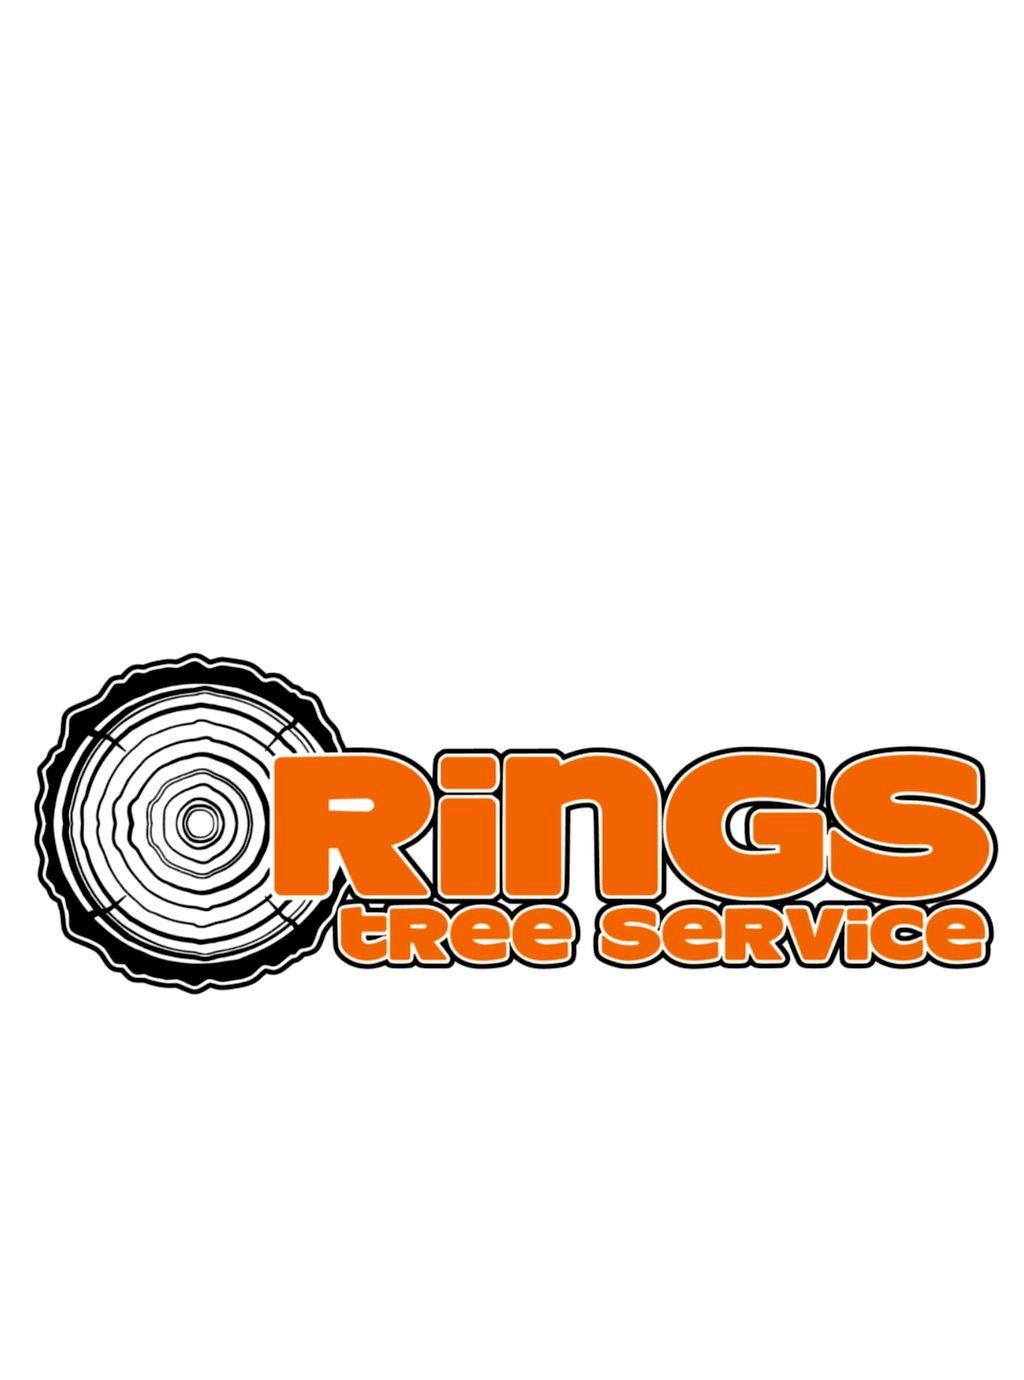 Rings Tree Service